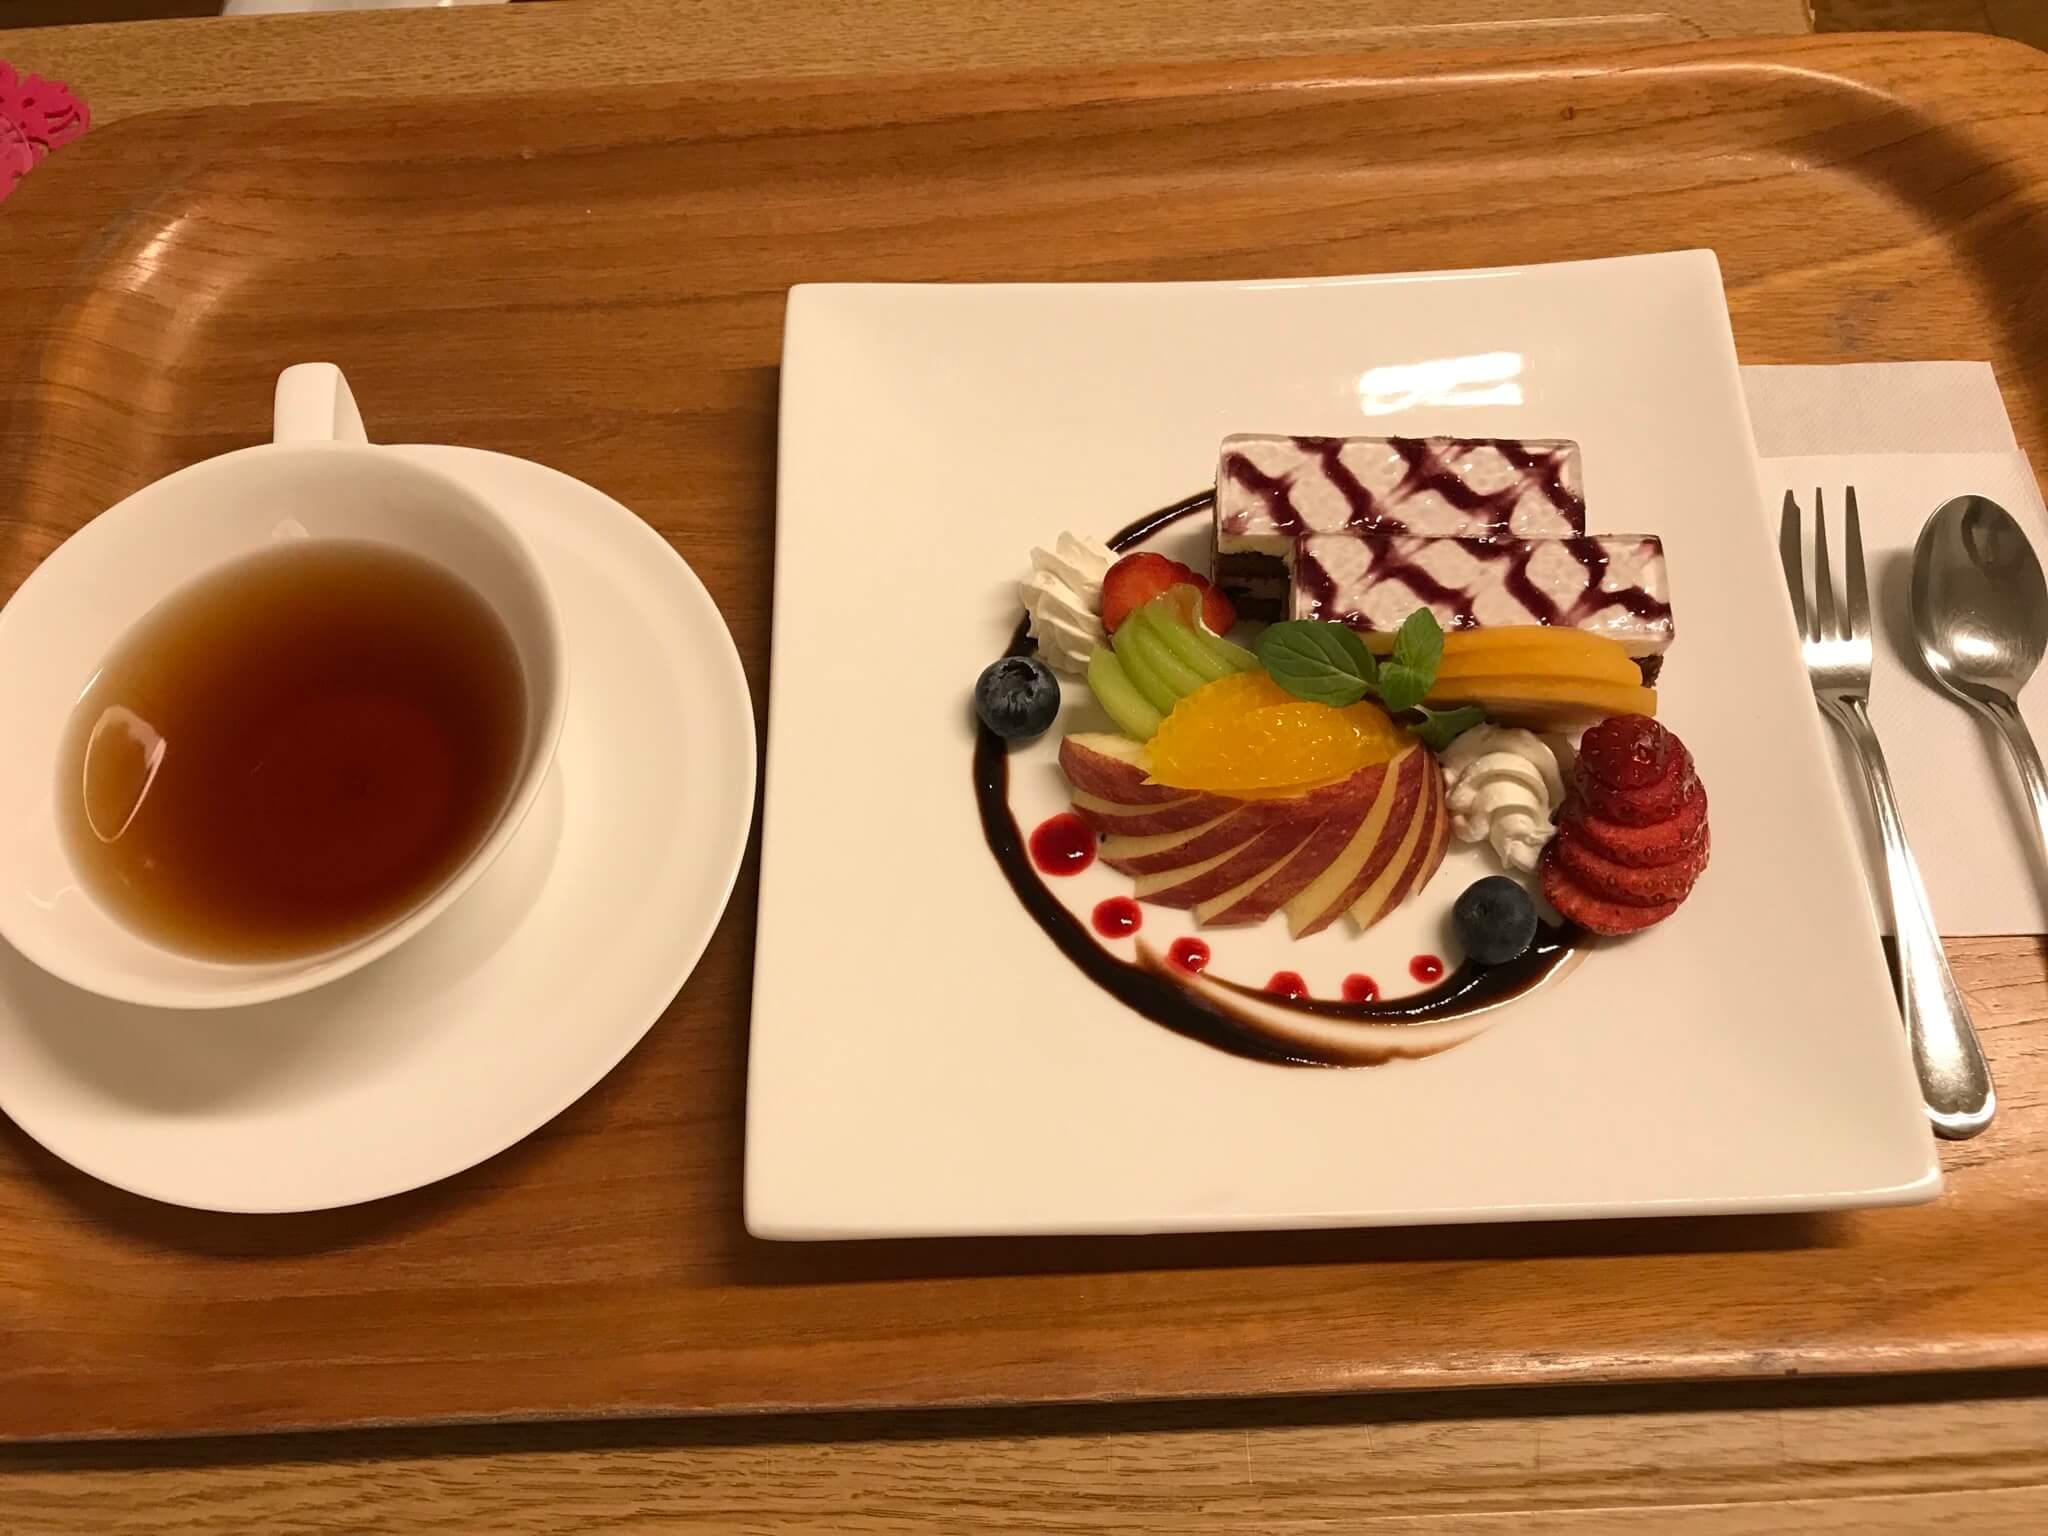 Japanese hospital meals 14 (1)